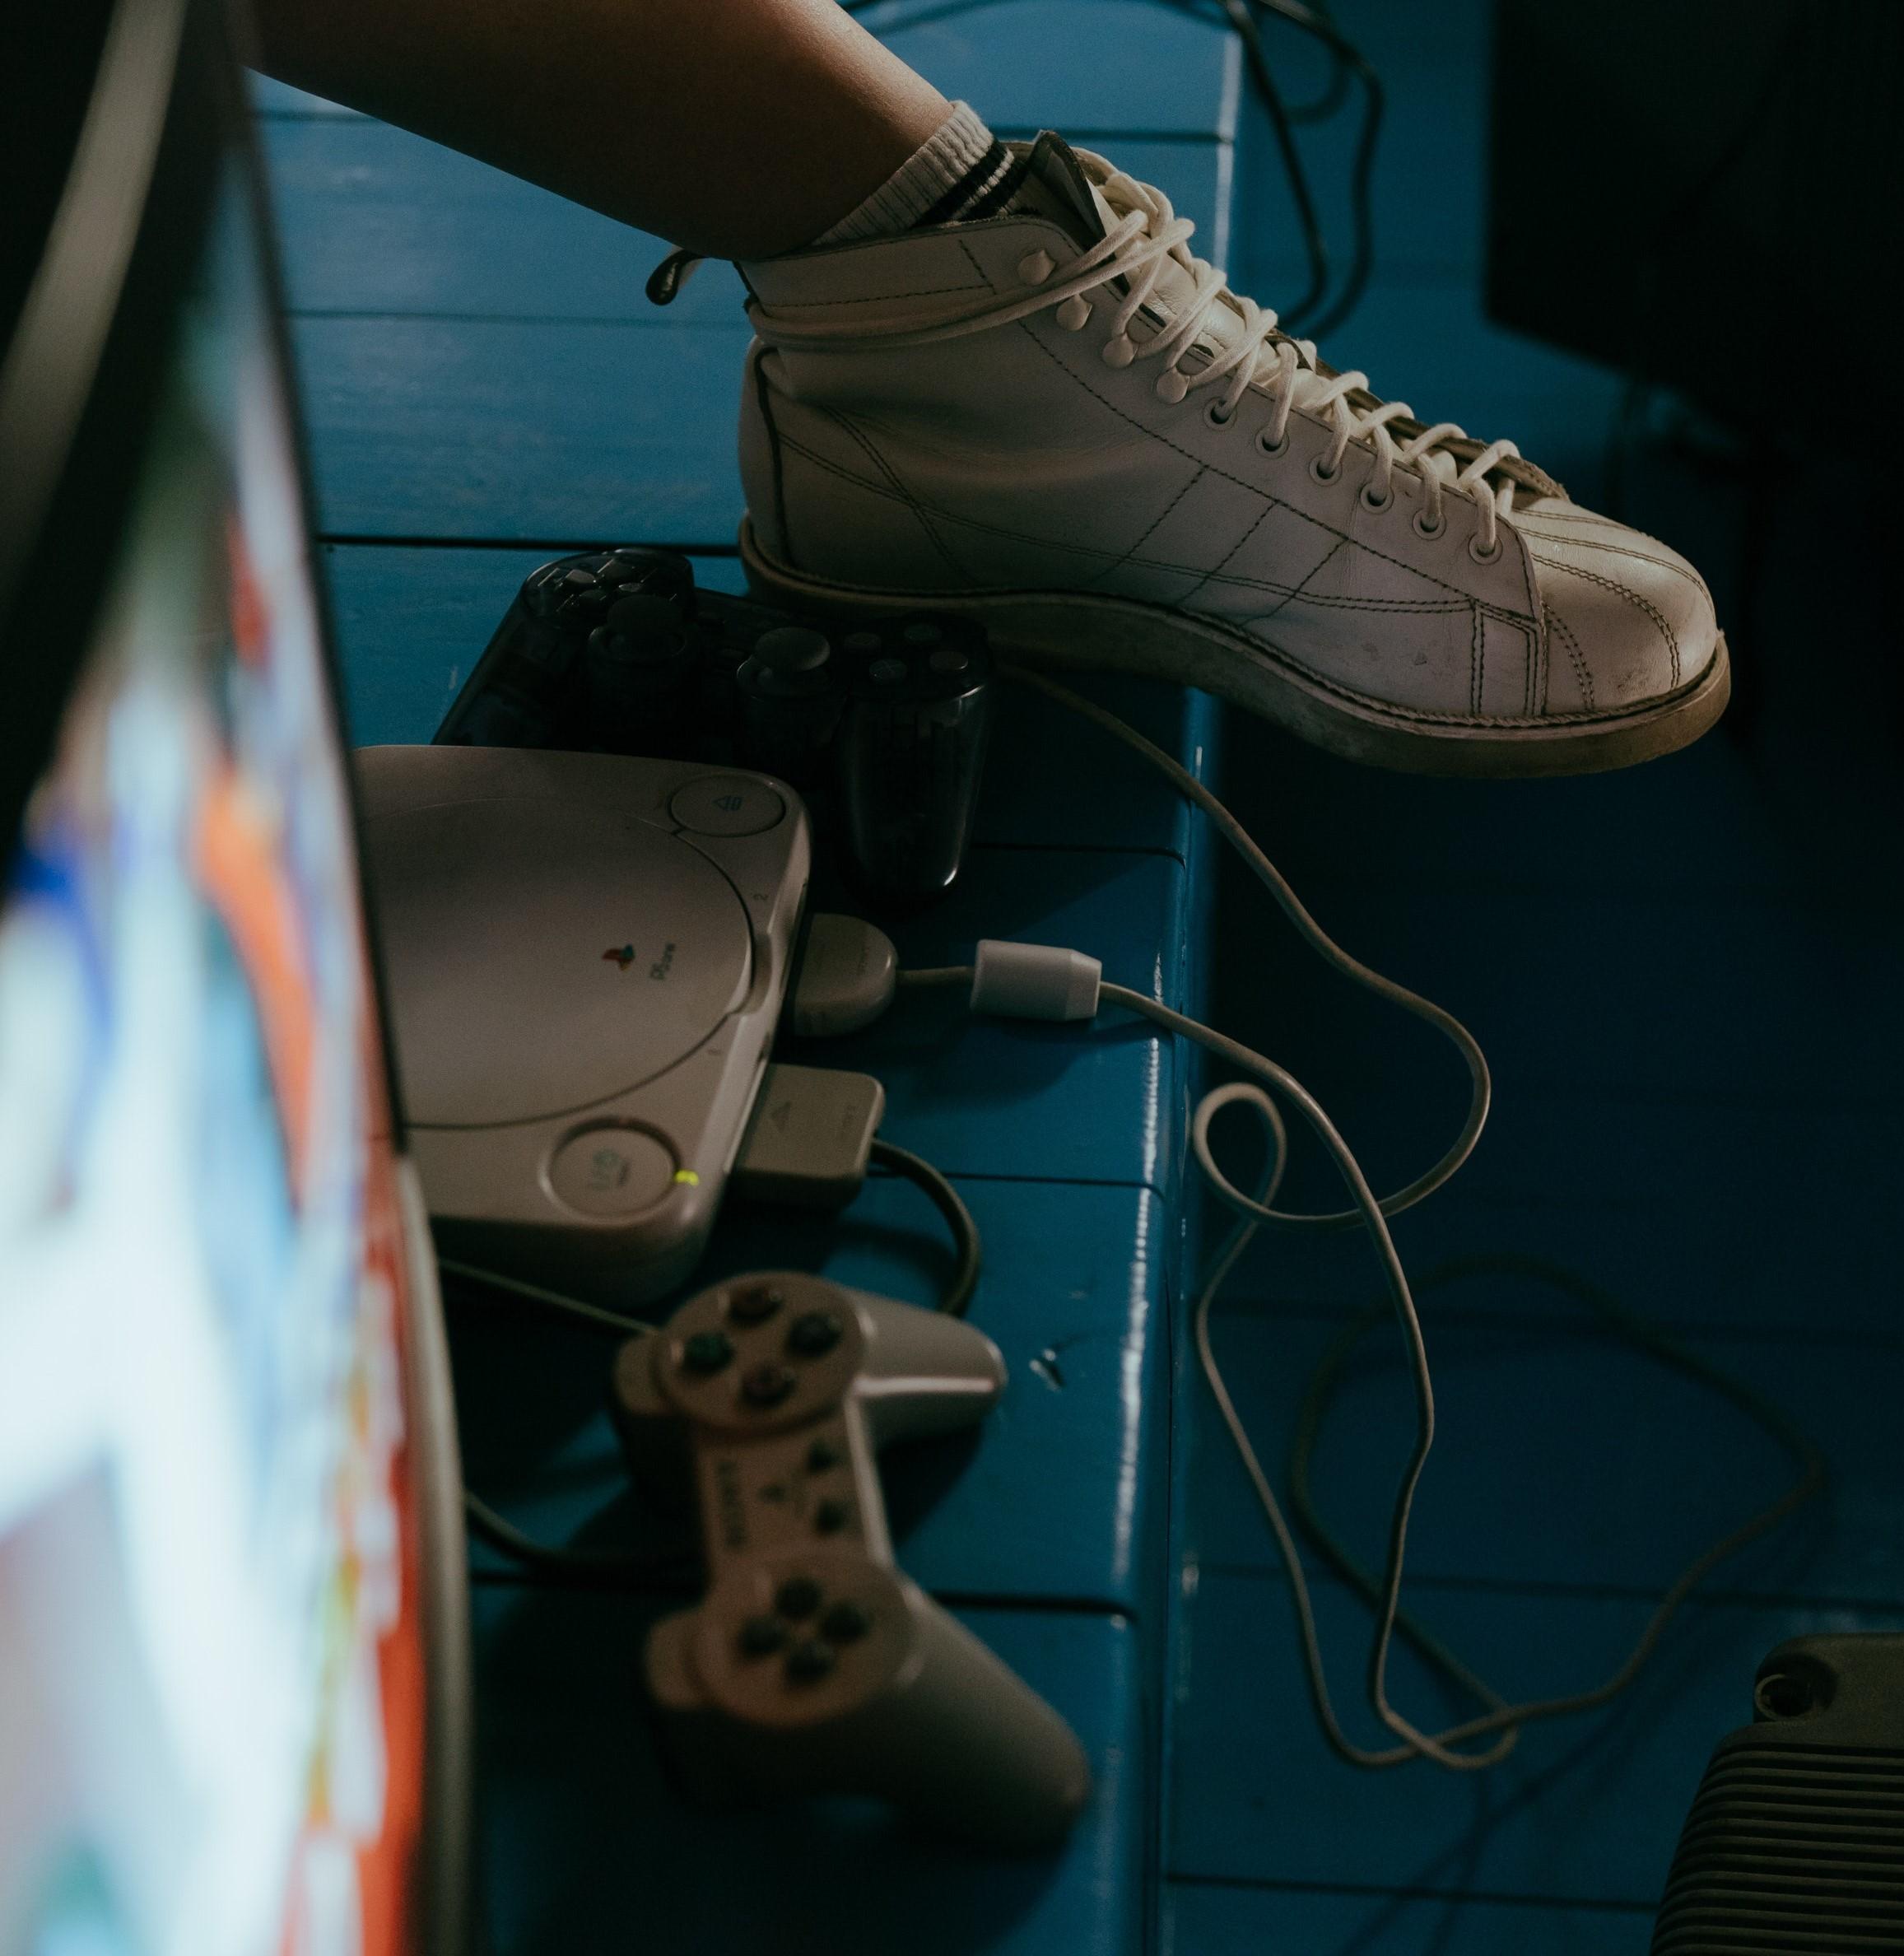 videogames playstation